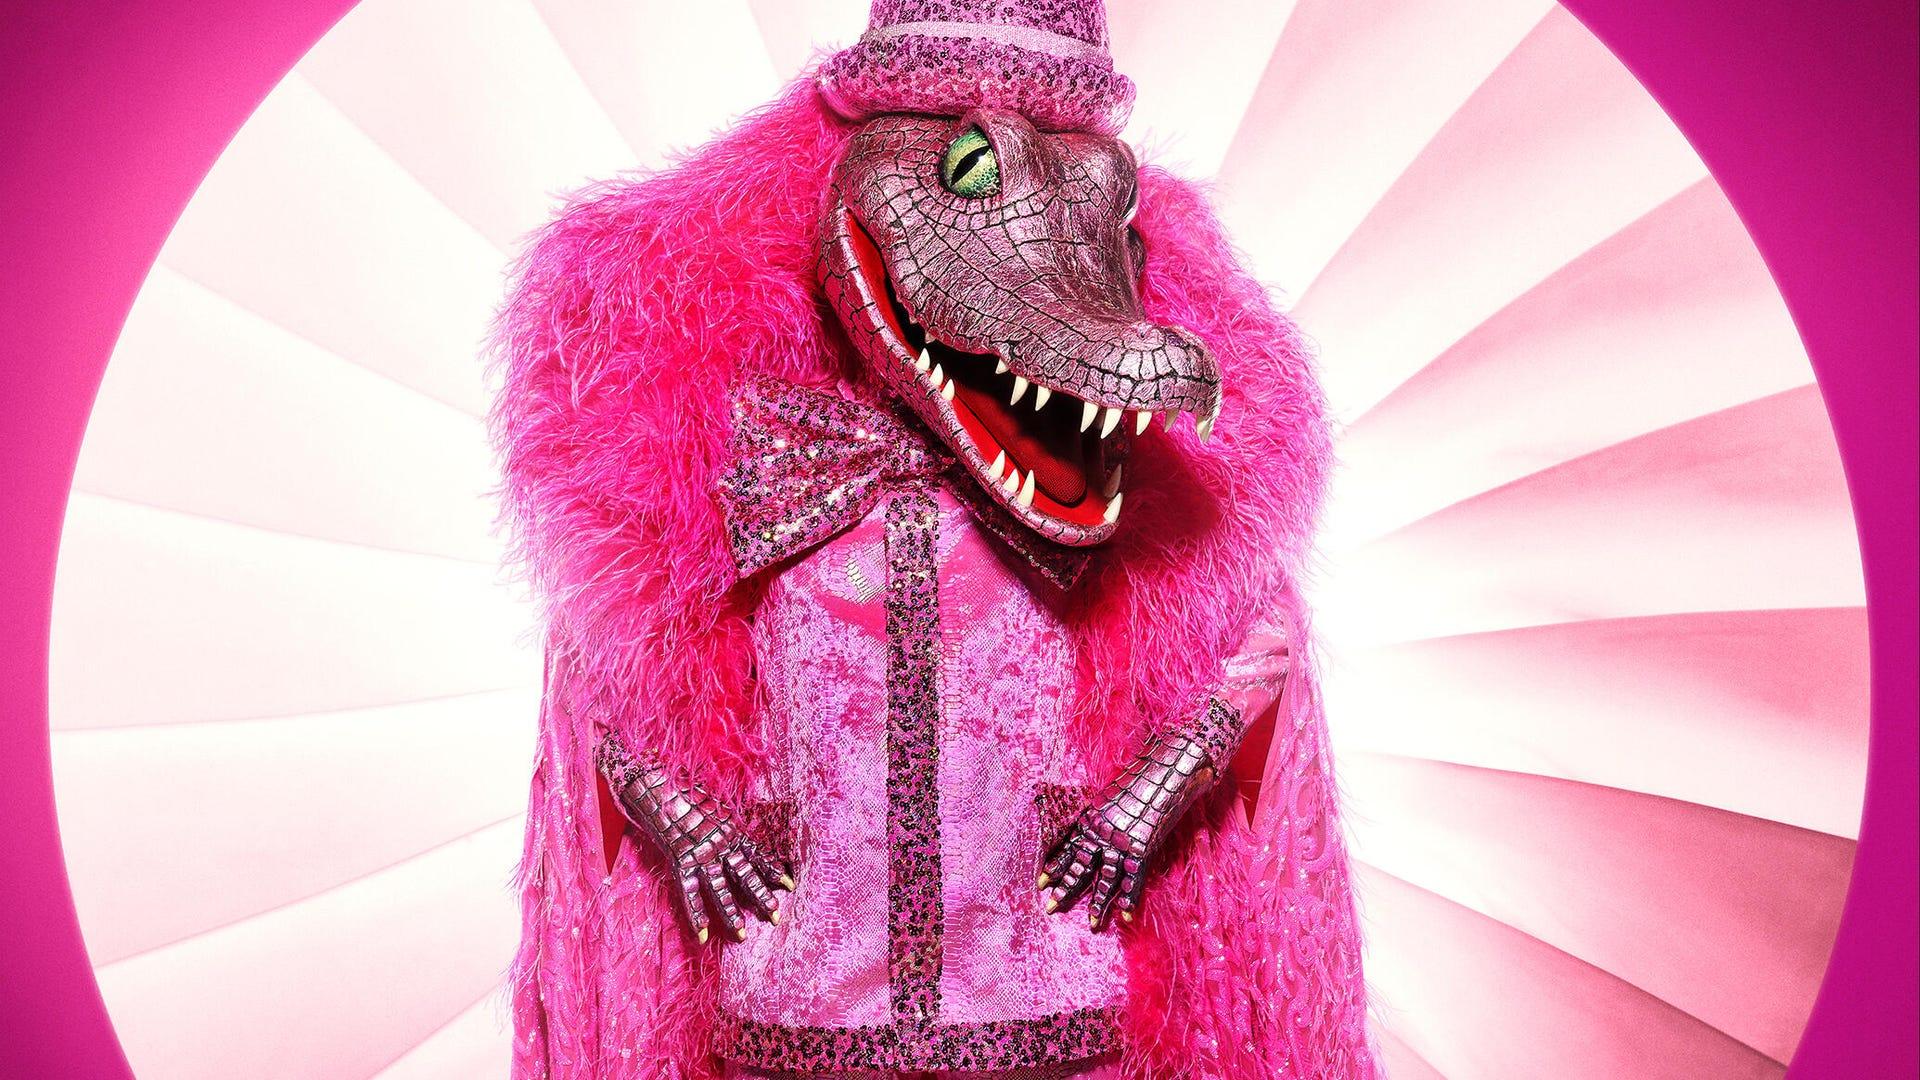 Crocodile, Masked Singer